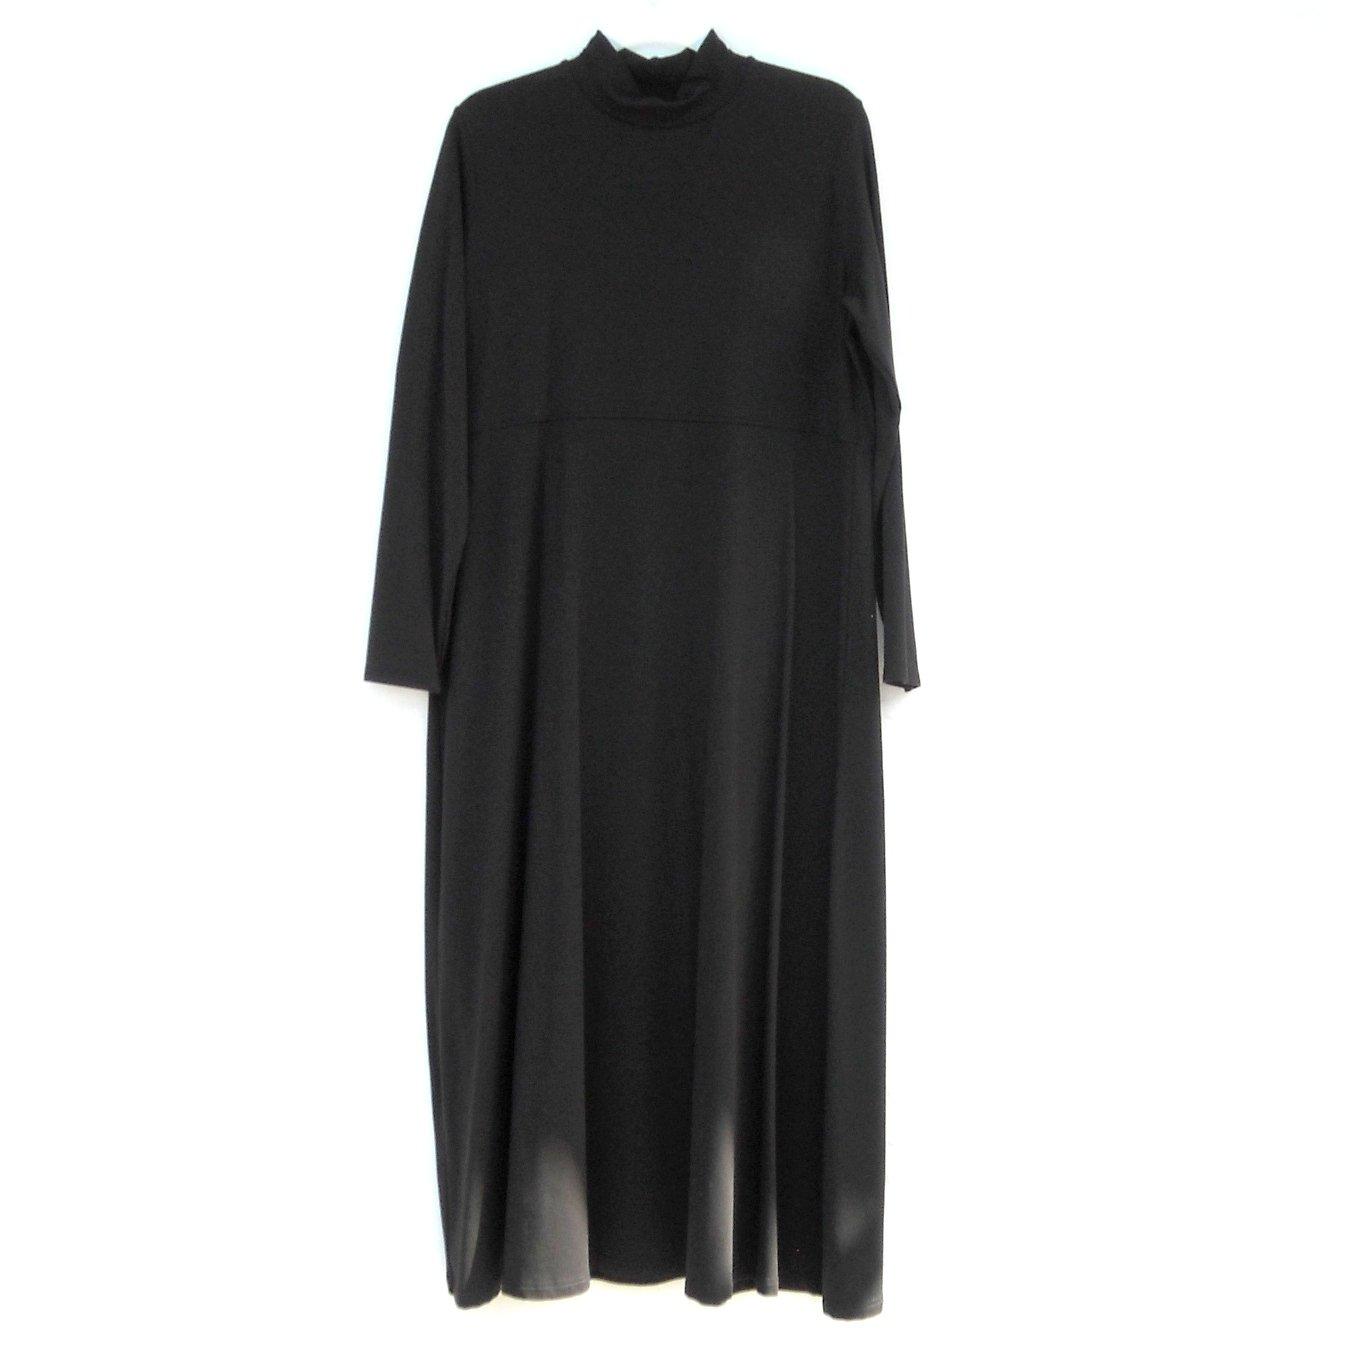 Womens TravelSmith Petite Black Dress Size L